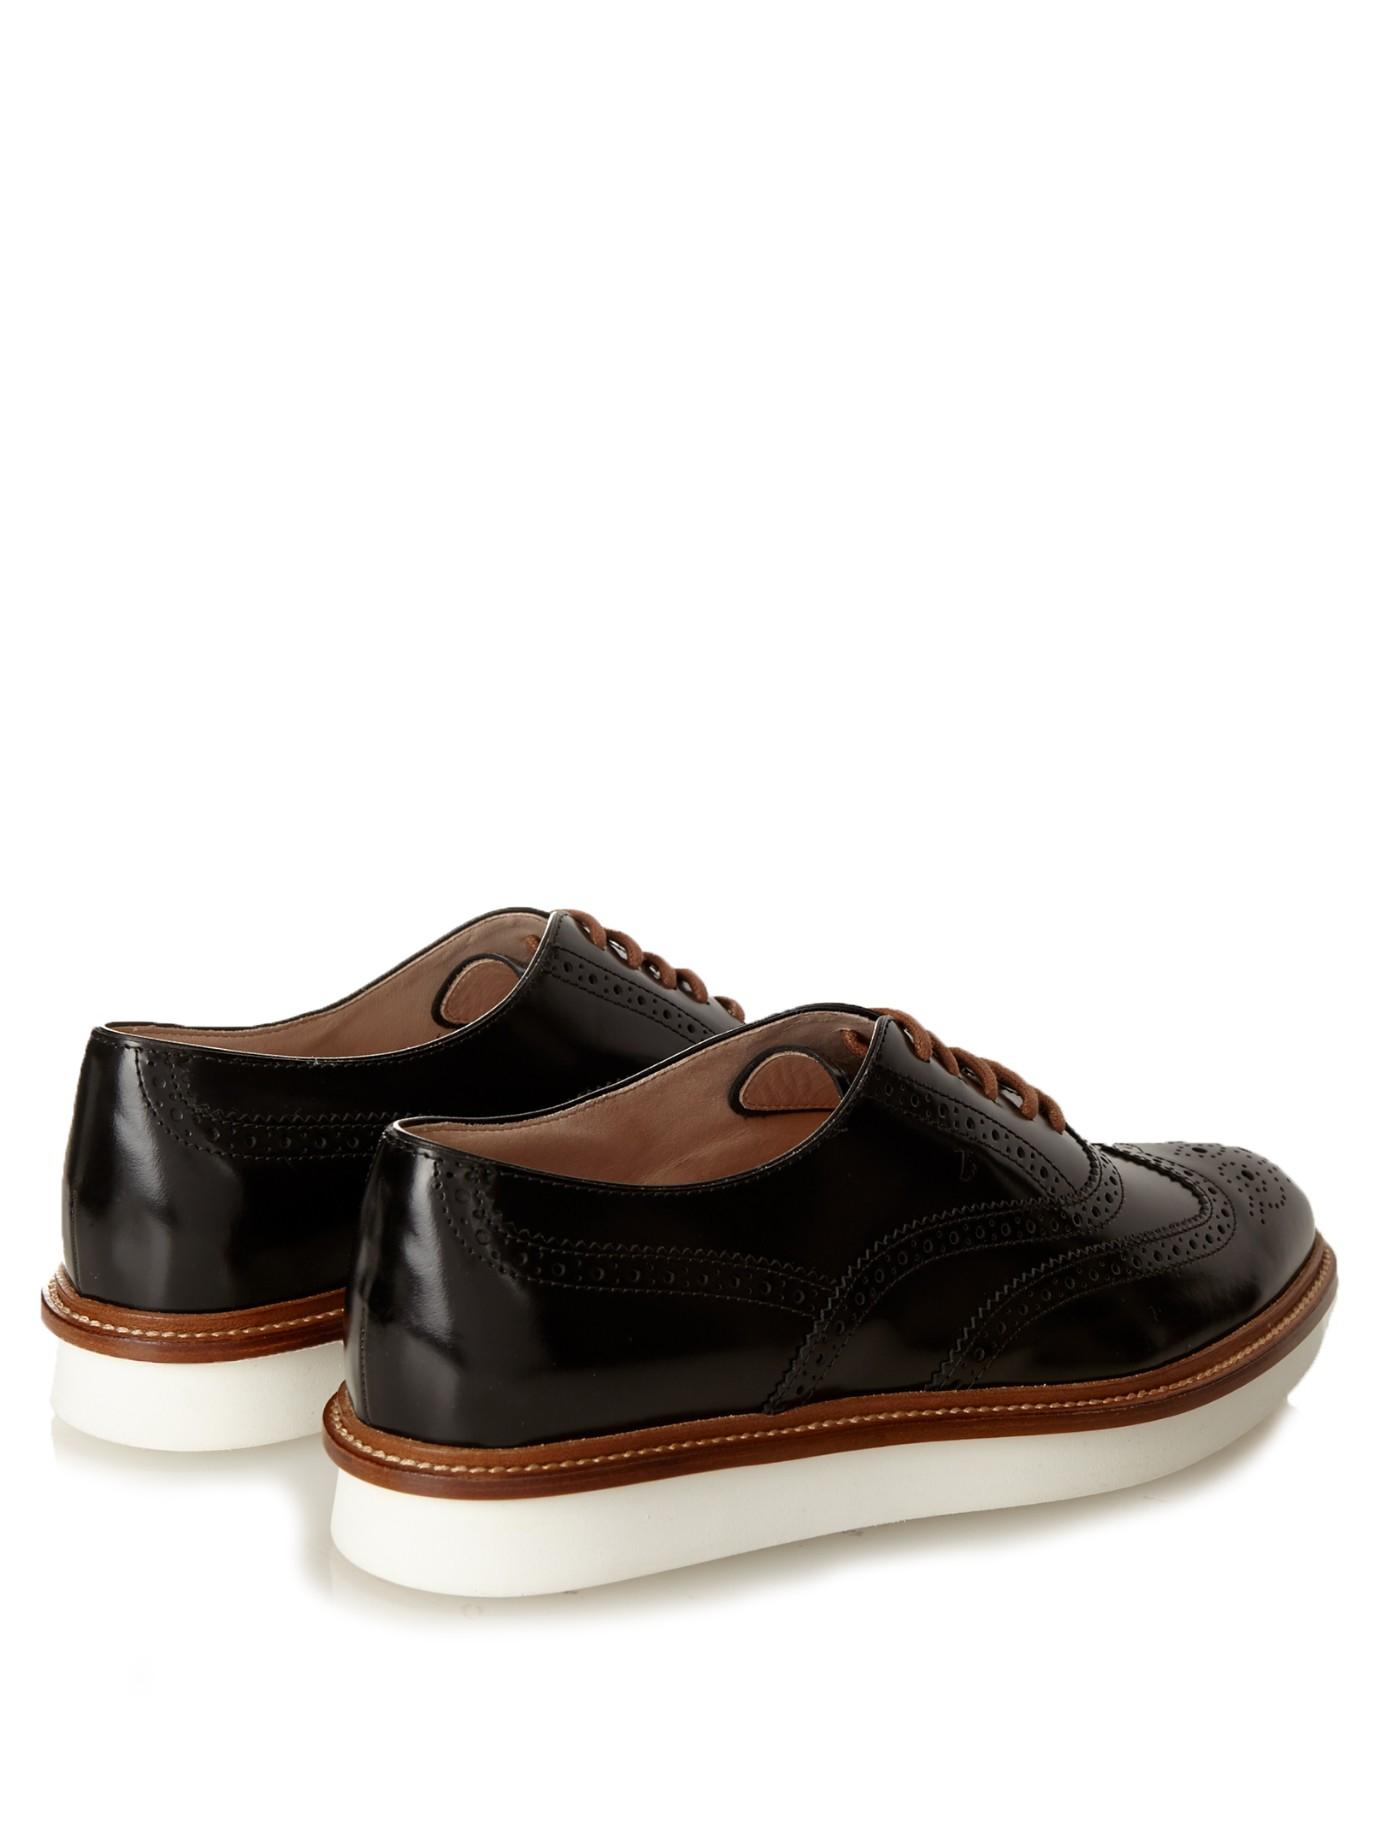 Mango Lace Up Oxford Shoes